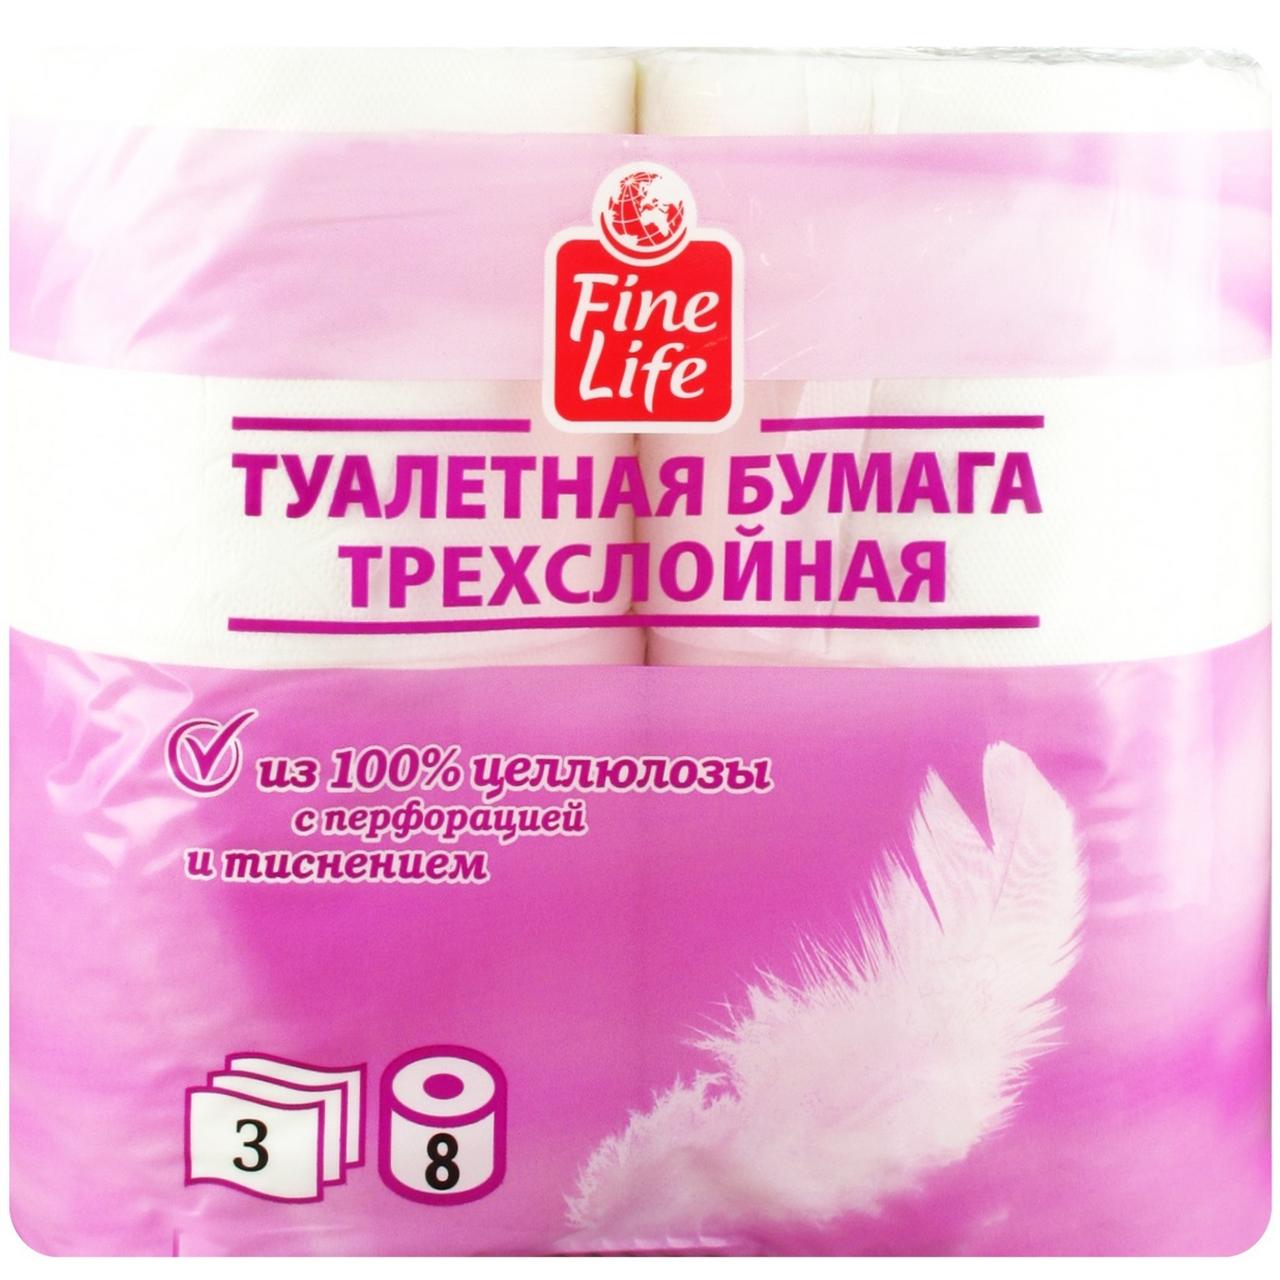 Бумага туалетная FINE LIFE Белая 3-слойная, 8 рулонов